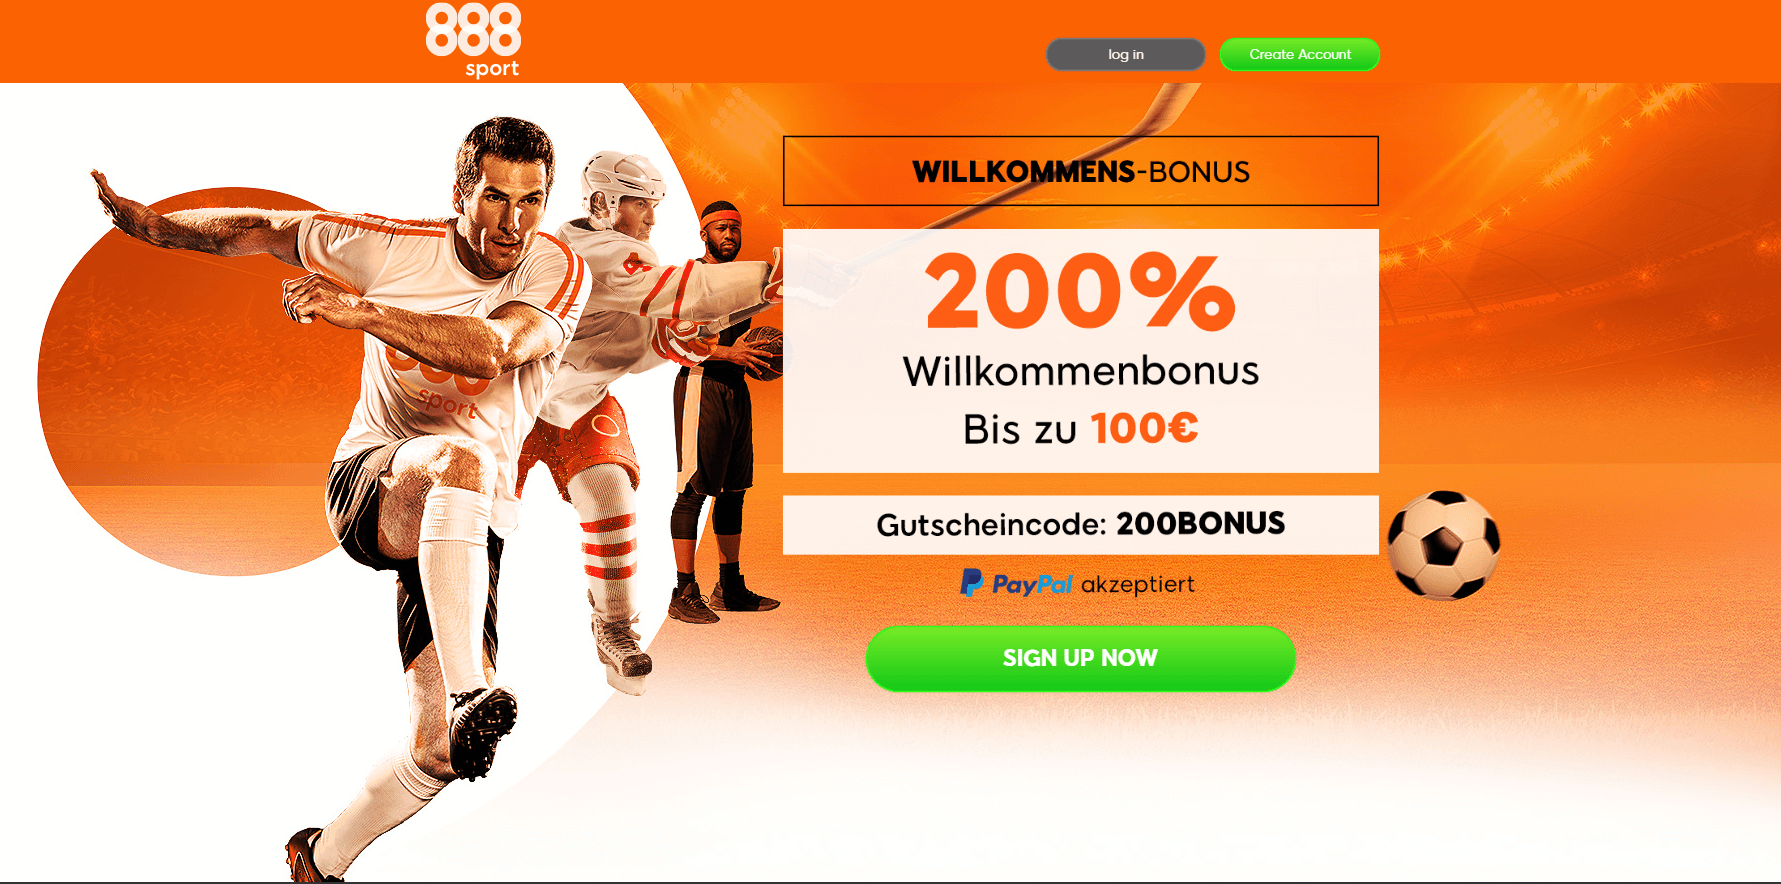 888sport New Bonus SS